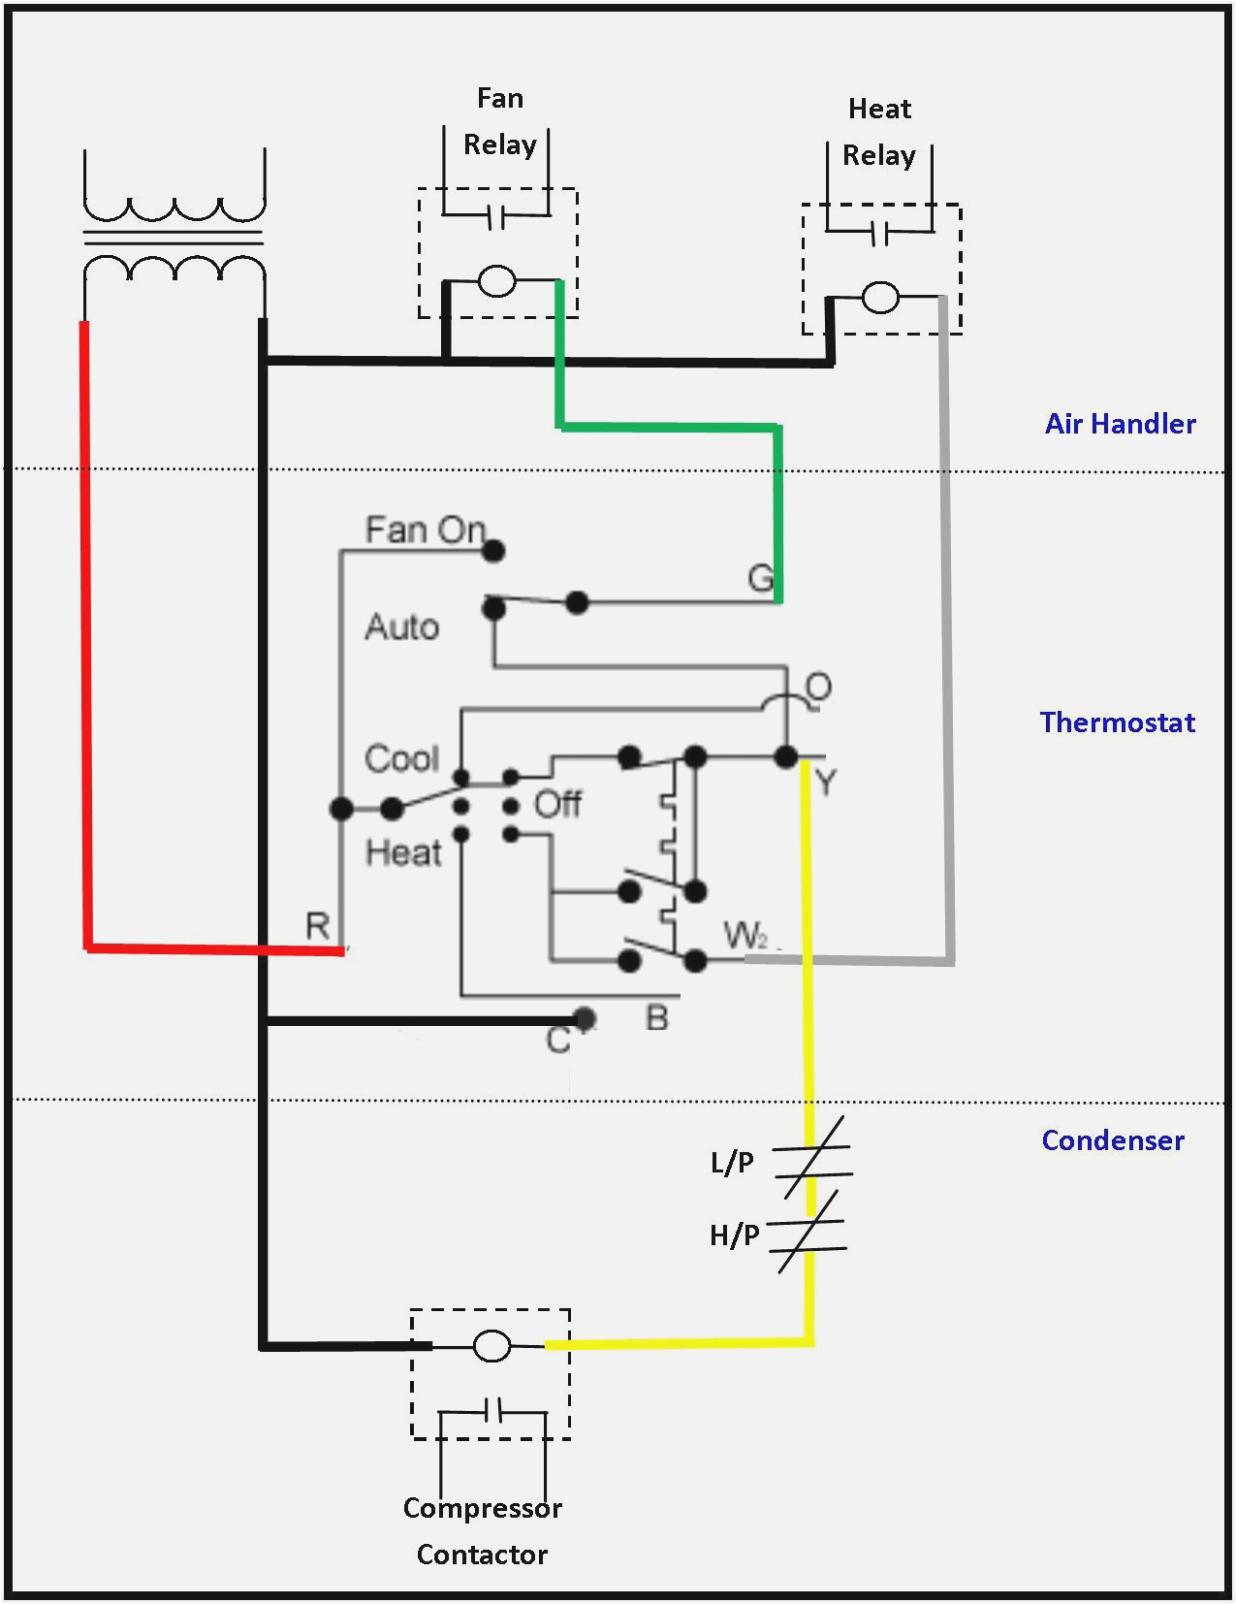 furnace gas valve wiring diagram simplified shapes gas furnace furnace gas valve wiring diagram png